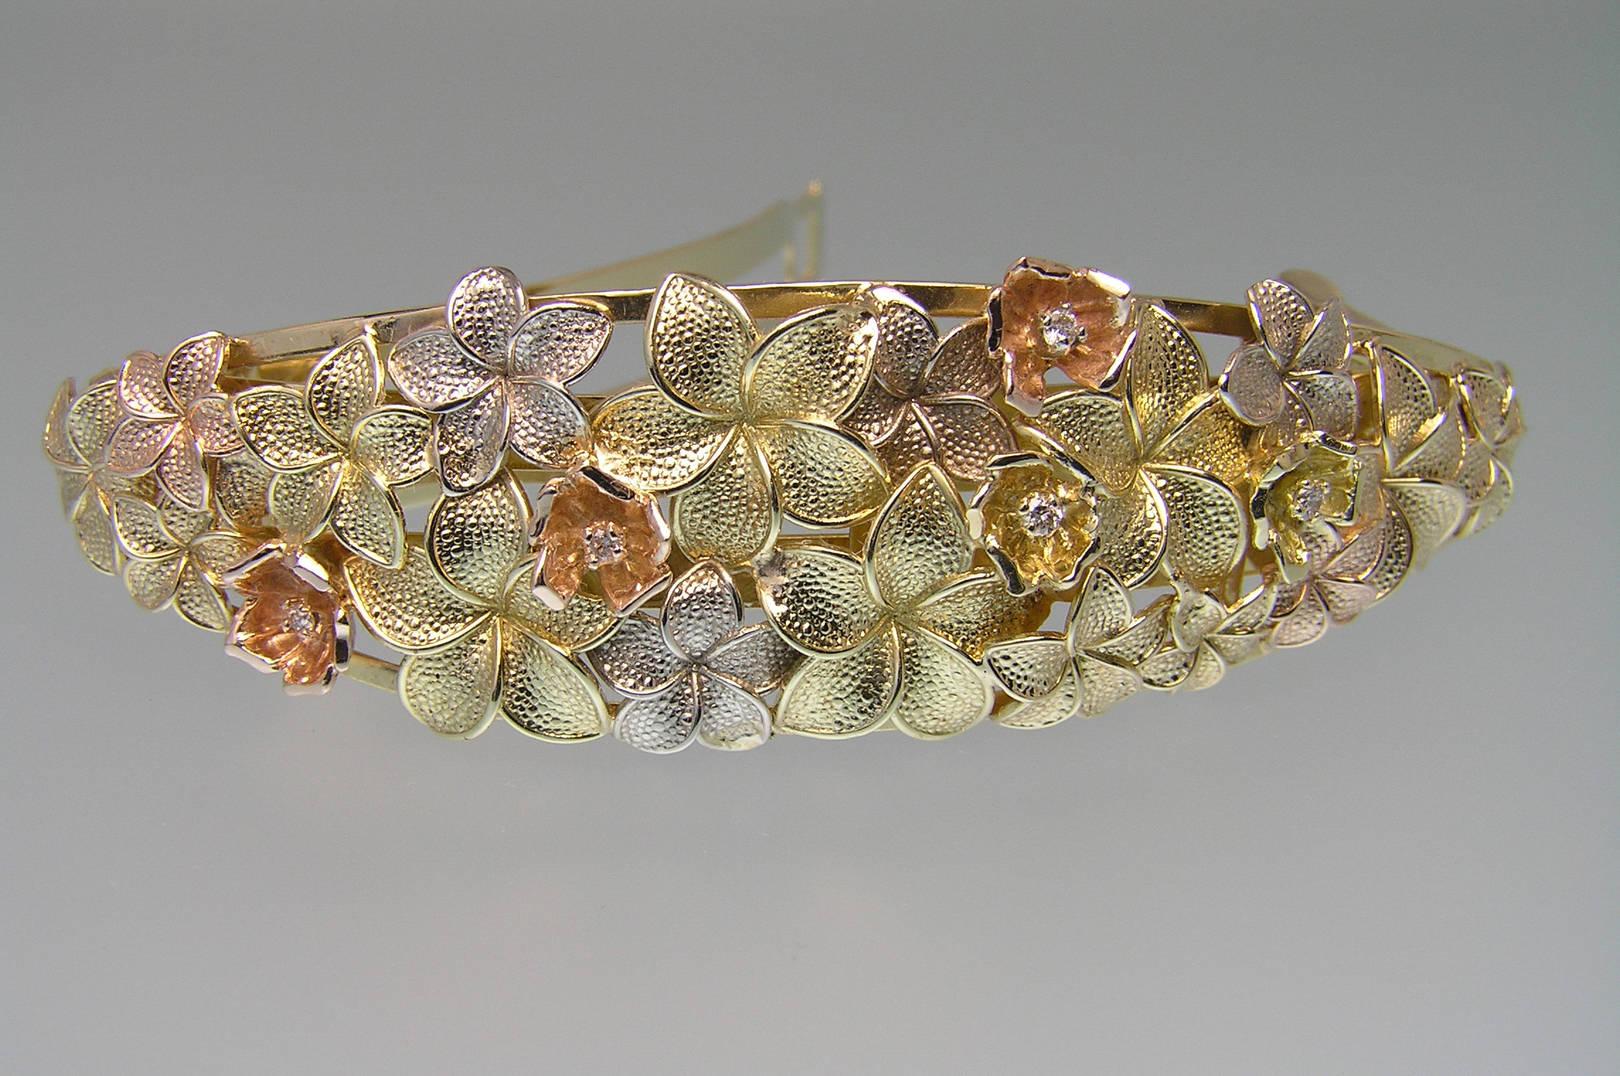 "Заколка для волос ""Клумба"". Золото трех видов, бриллианты, , авторская техника."